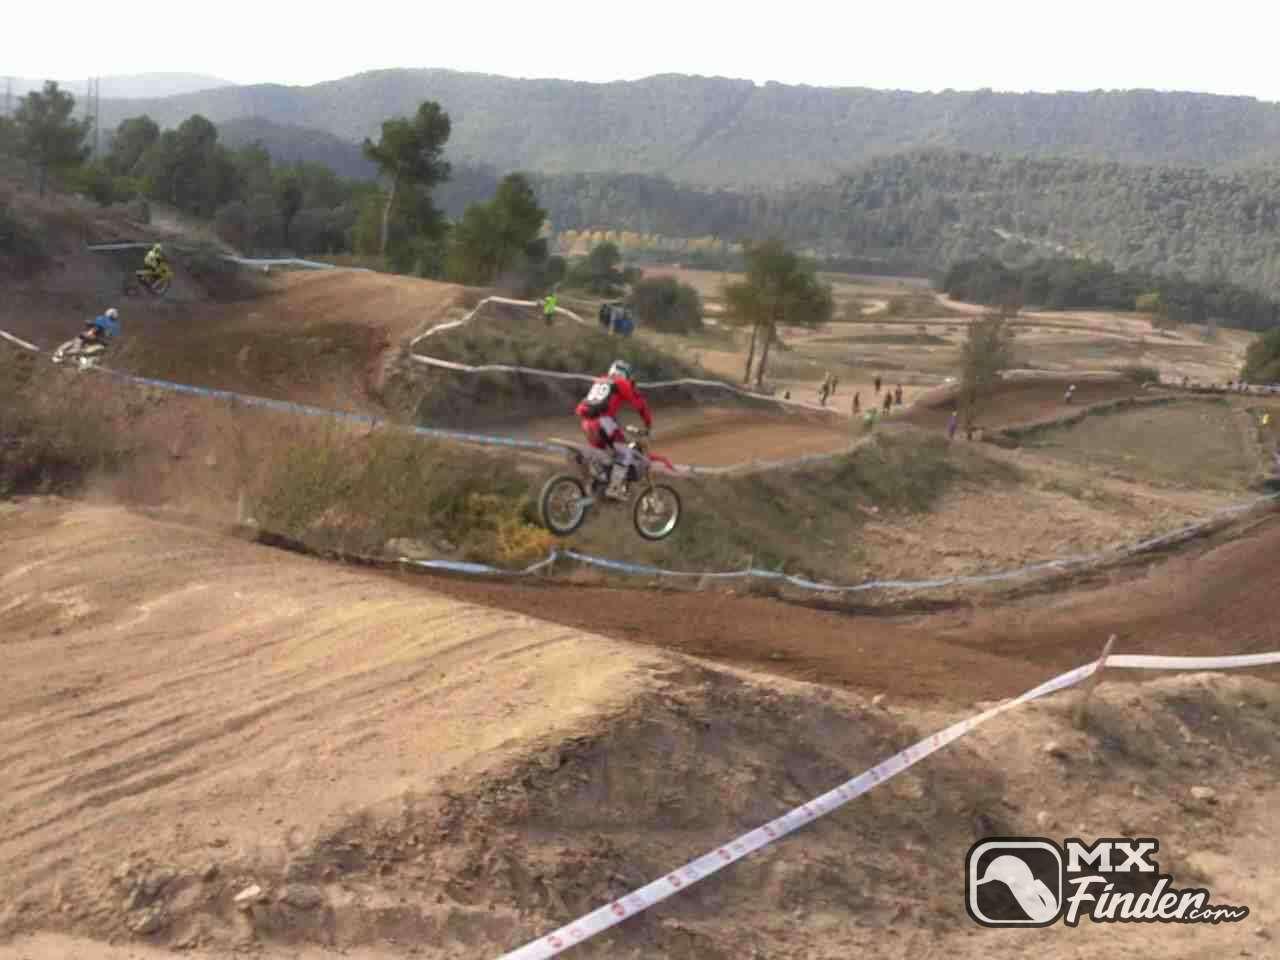 motocross, MC Can Taulé, Sant Salvador de Torroella, motocross track